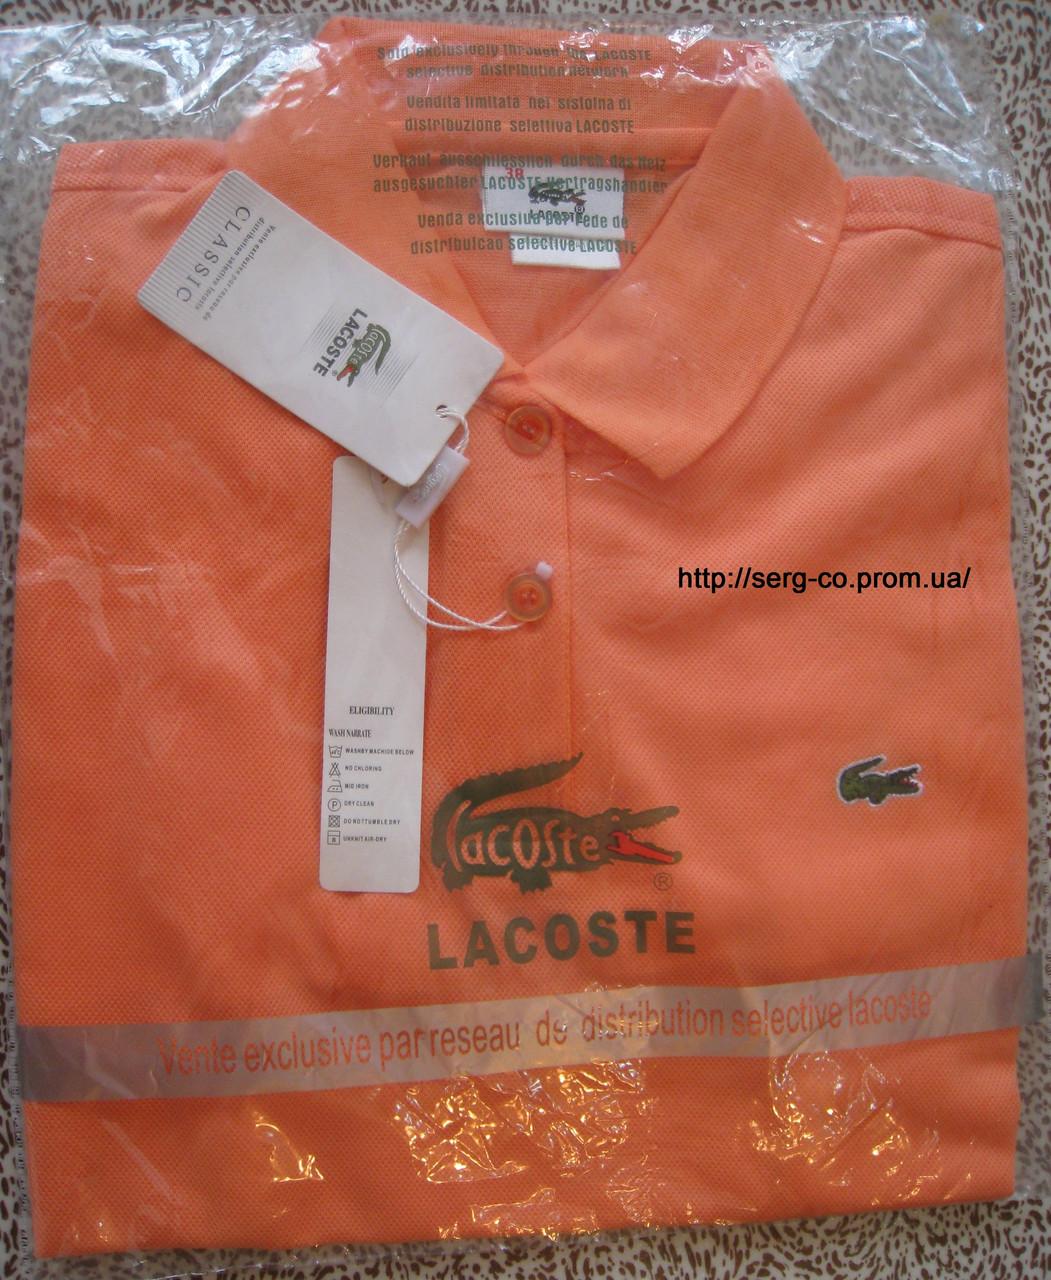 LACOSTE женские футболки поло лакоста лакосте купить в Украине, фото 1